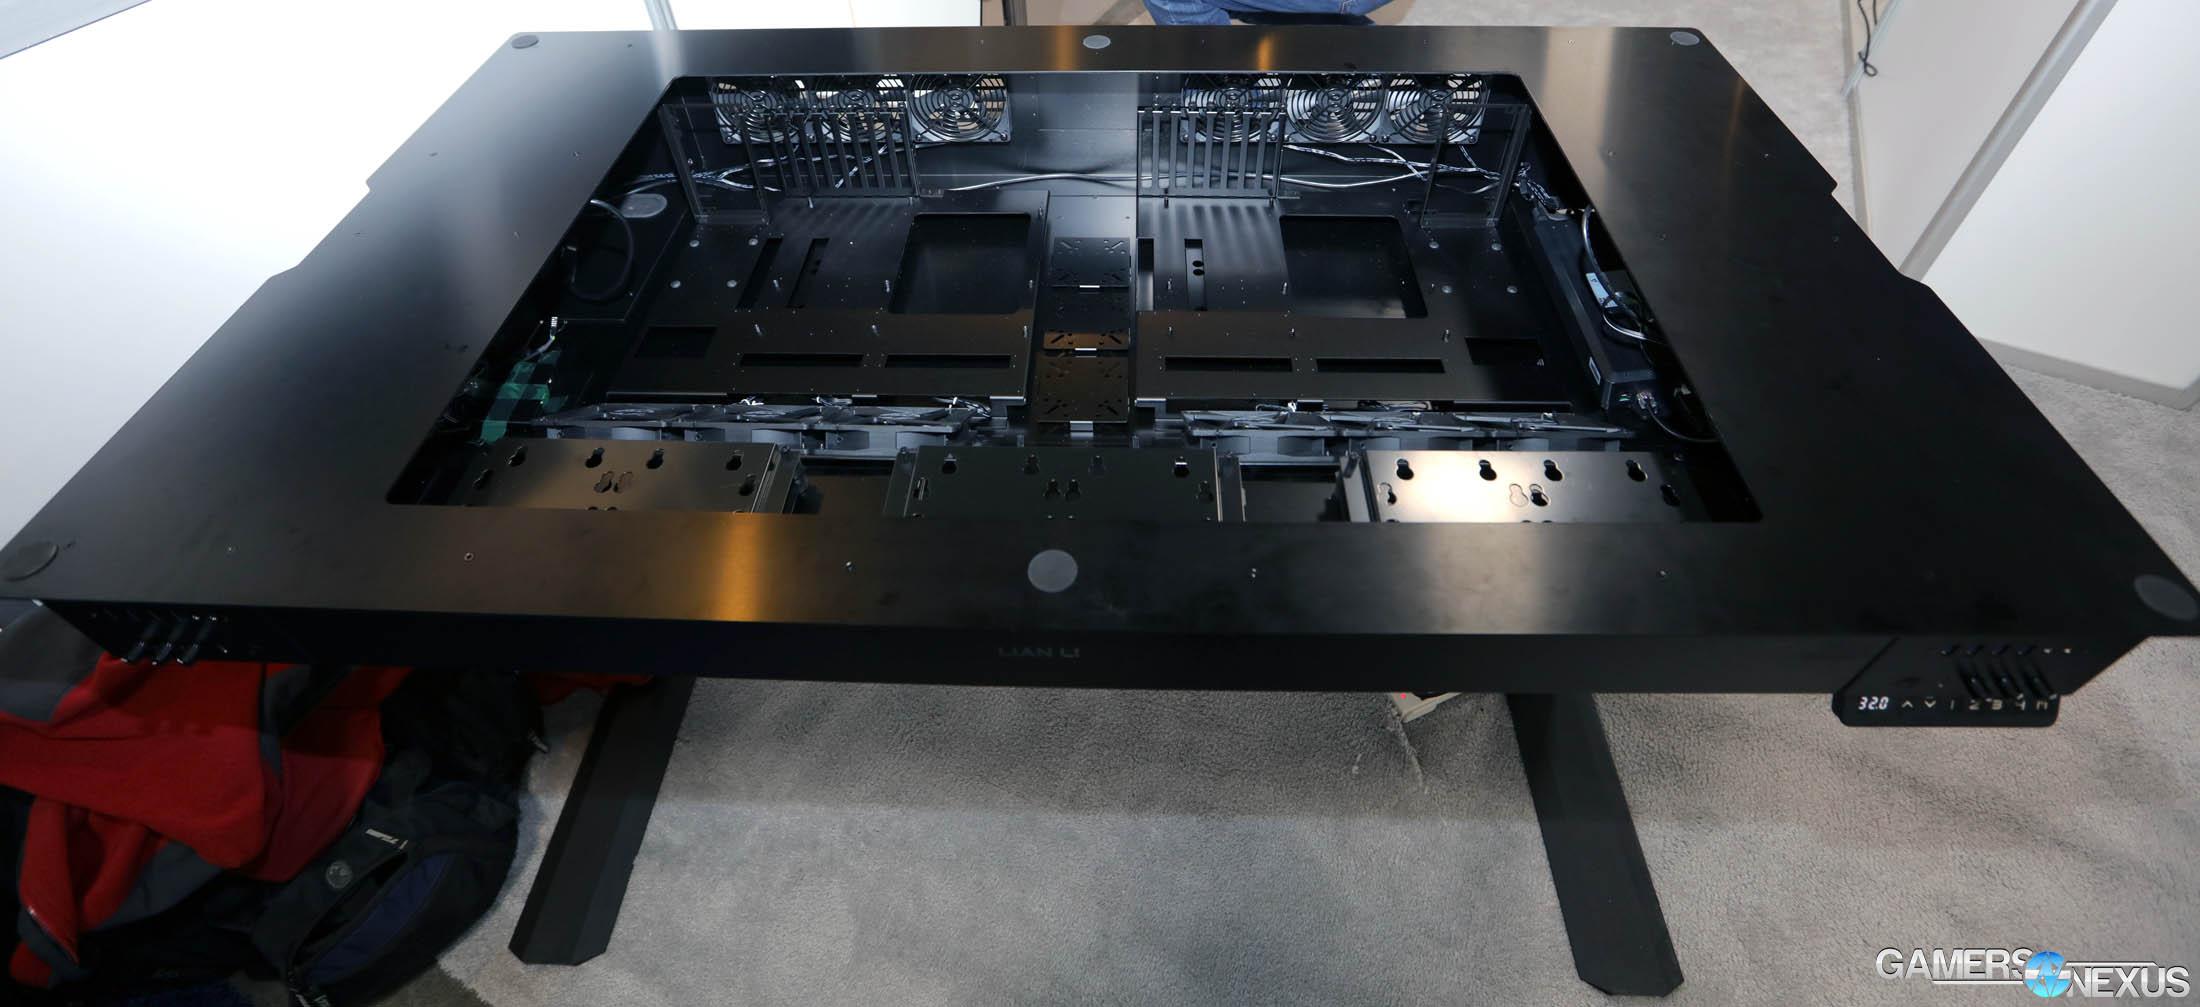 mirror infinity an build infinite desk deskcase musings case computer mod